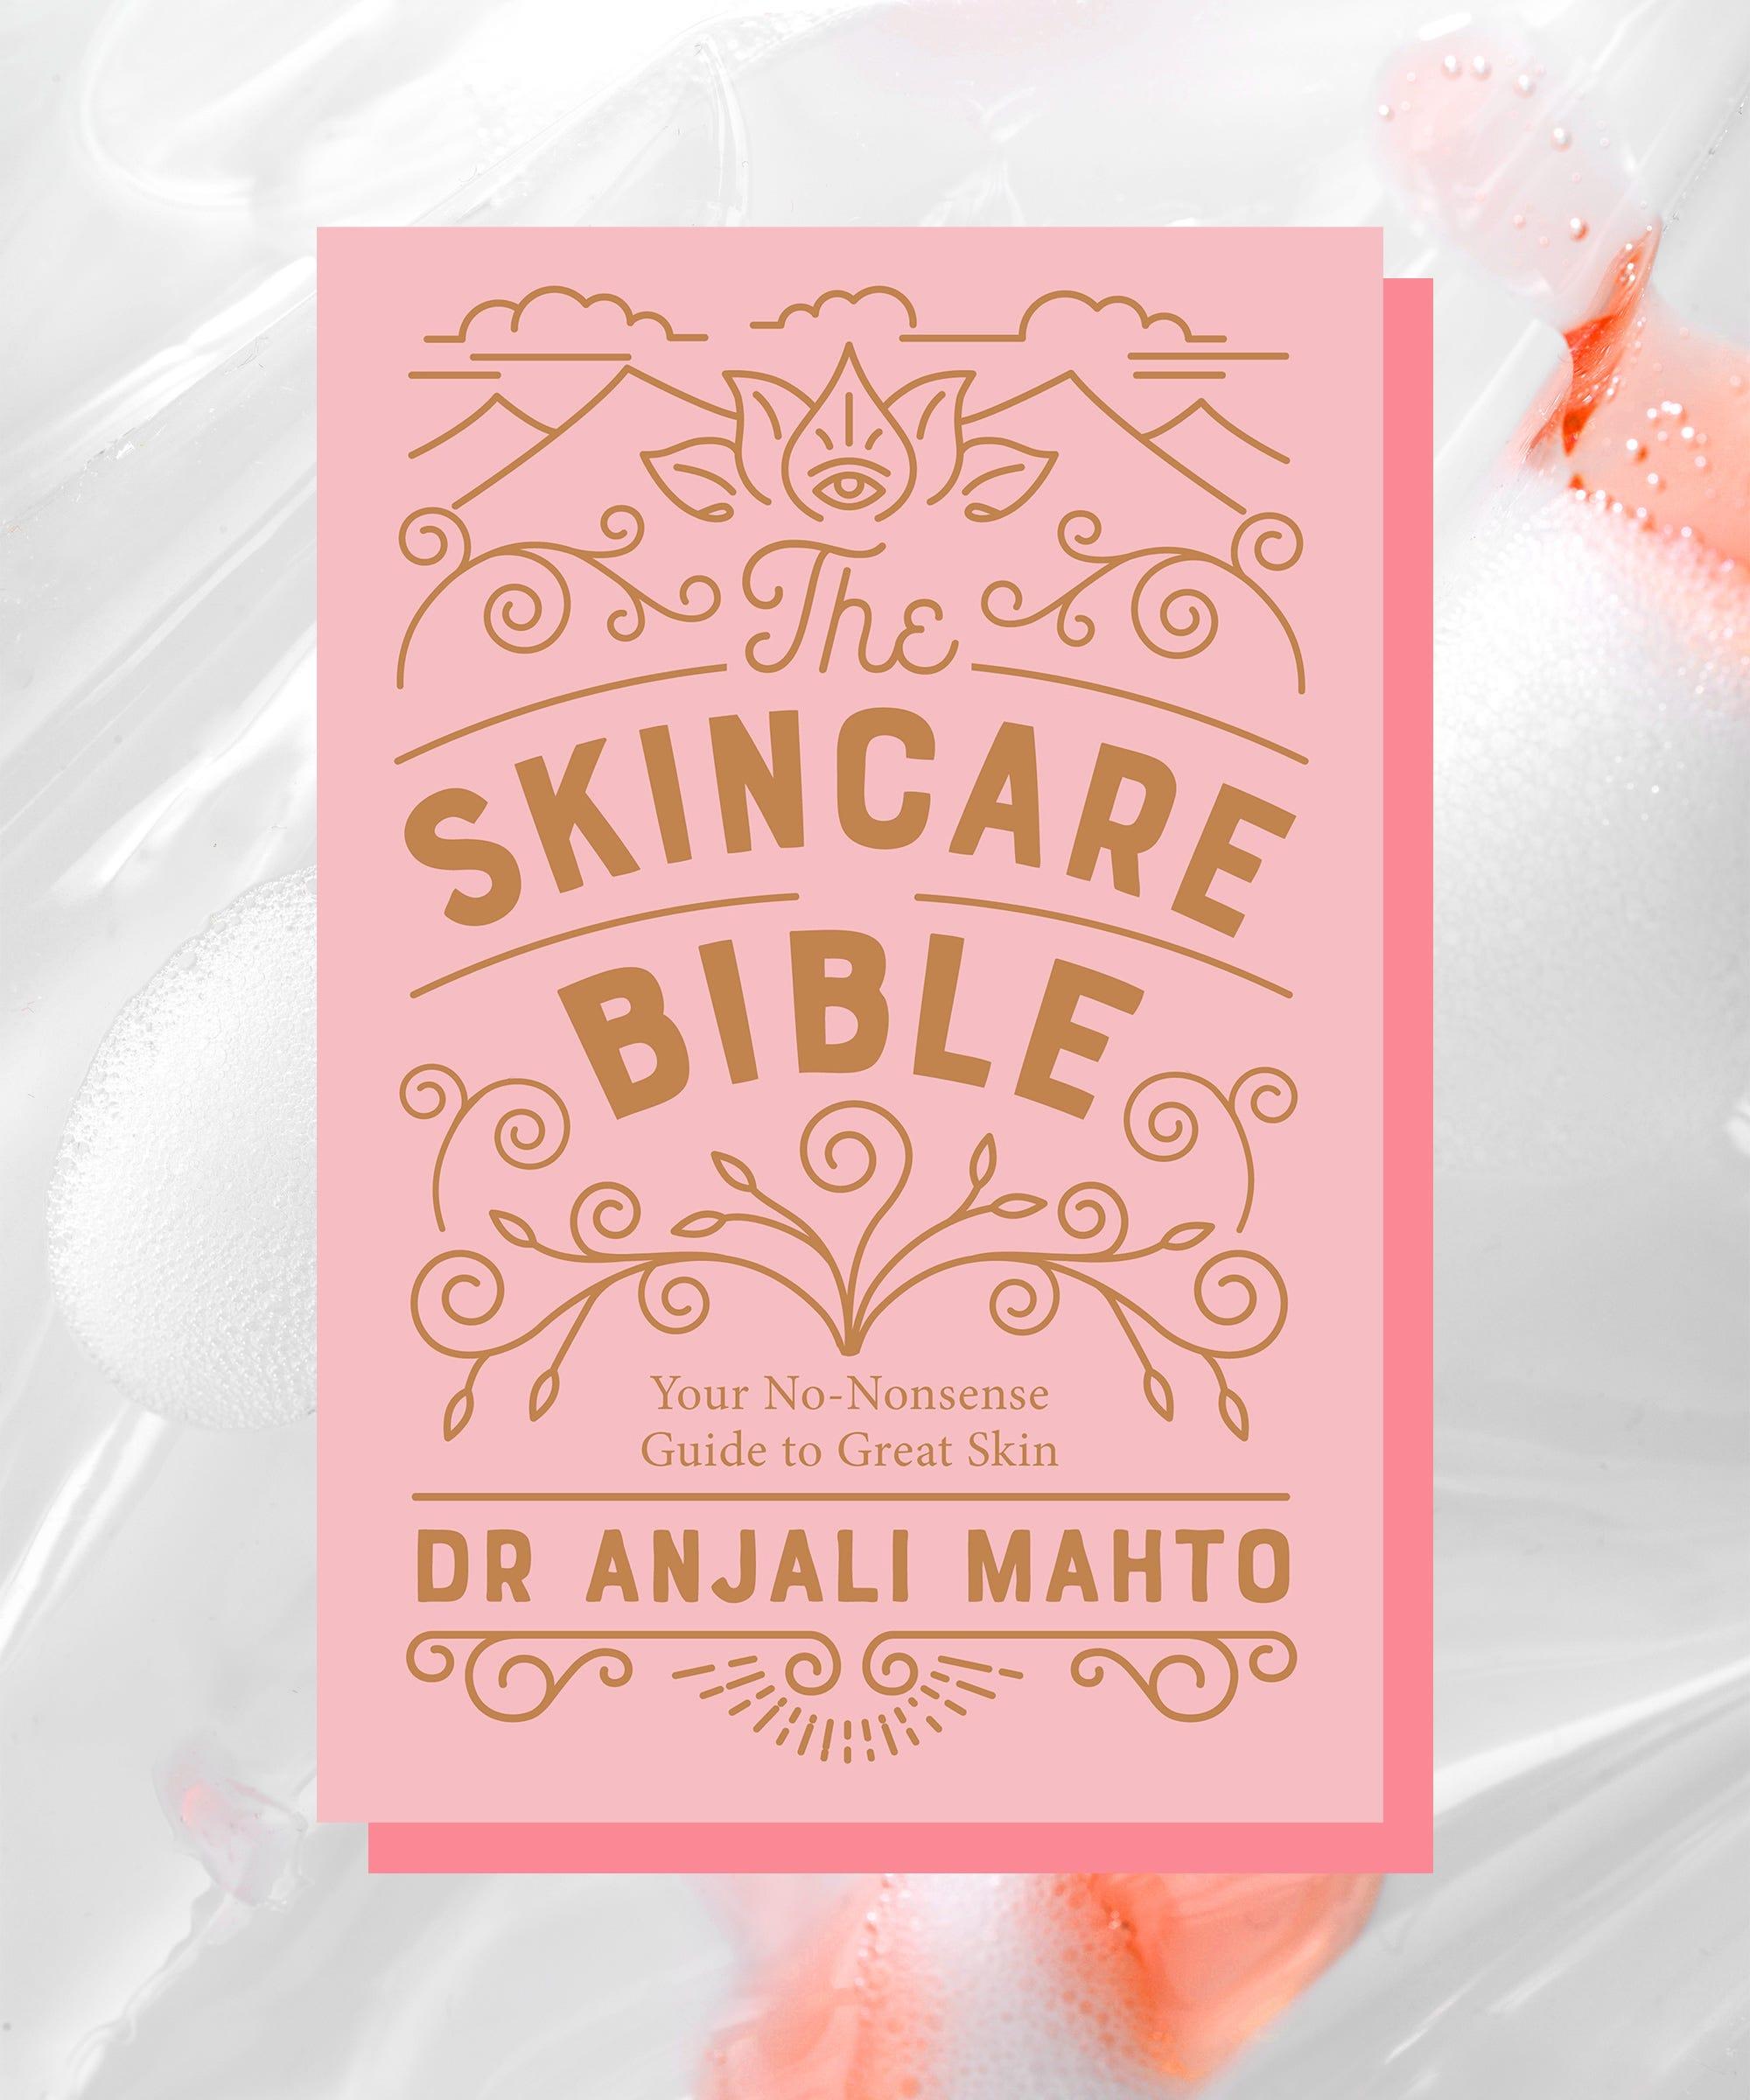 Best Skincare Book Dr Anjali Mahto